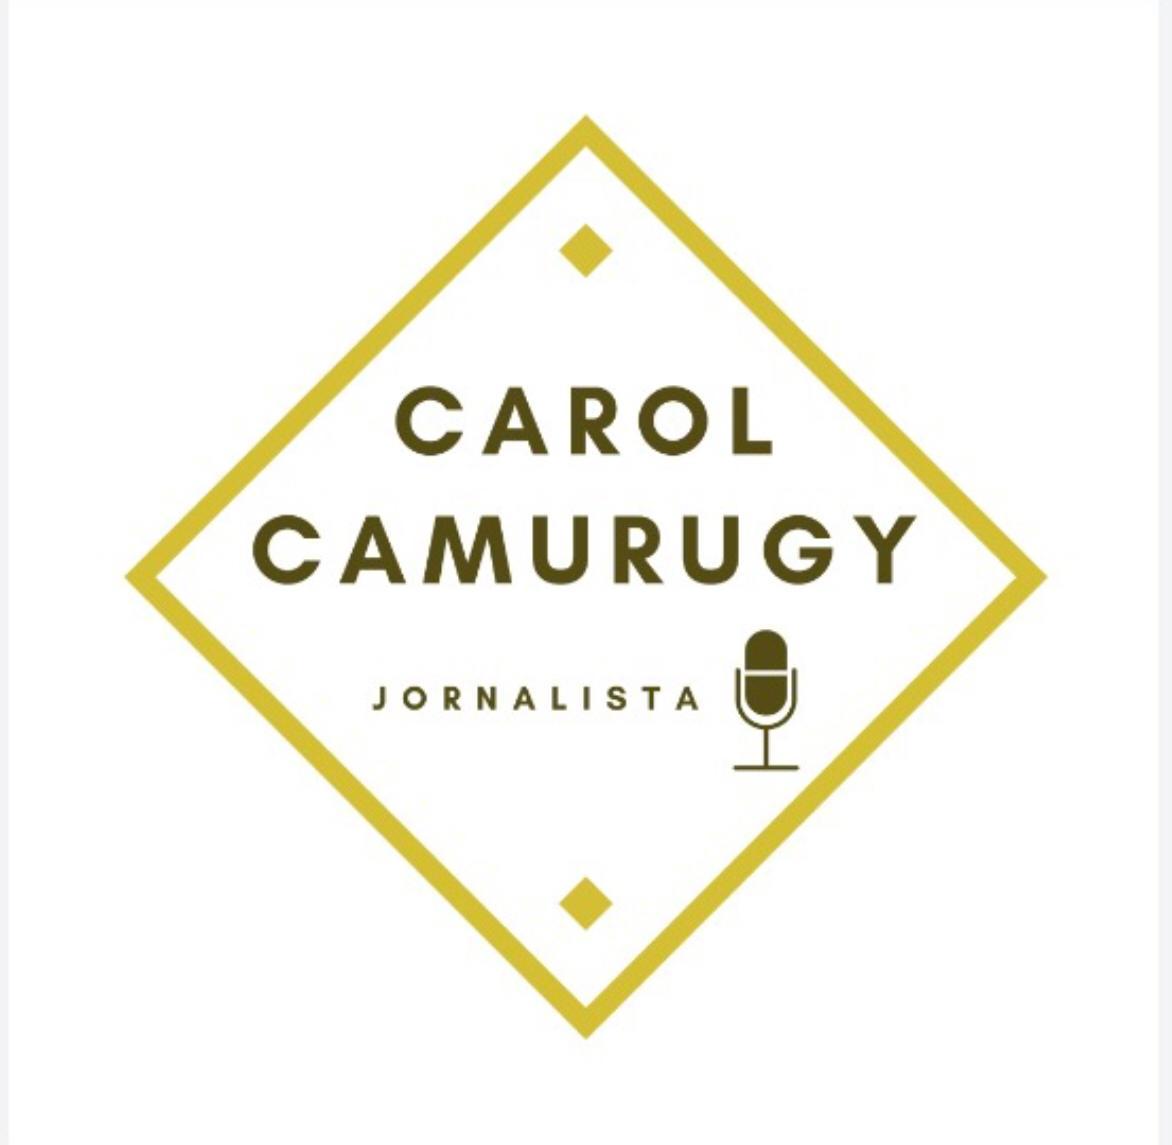 CAROL CAMURUGY